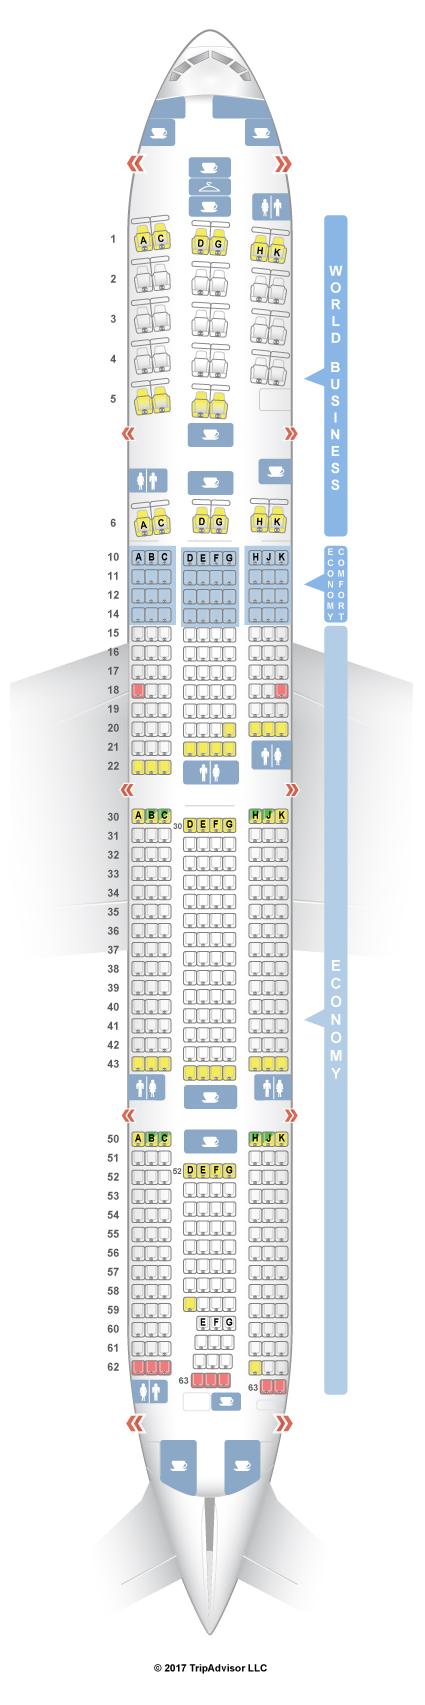 Seatguru Seat Map Klm Boeing 777 300er Brokeasshome Com Philippine Airlines Seating